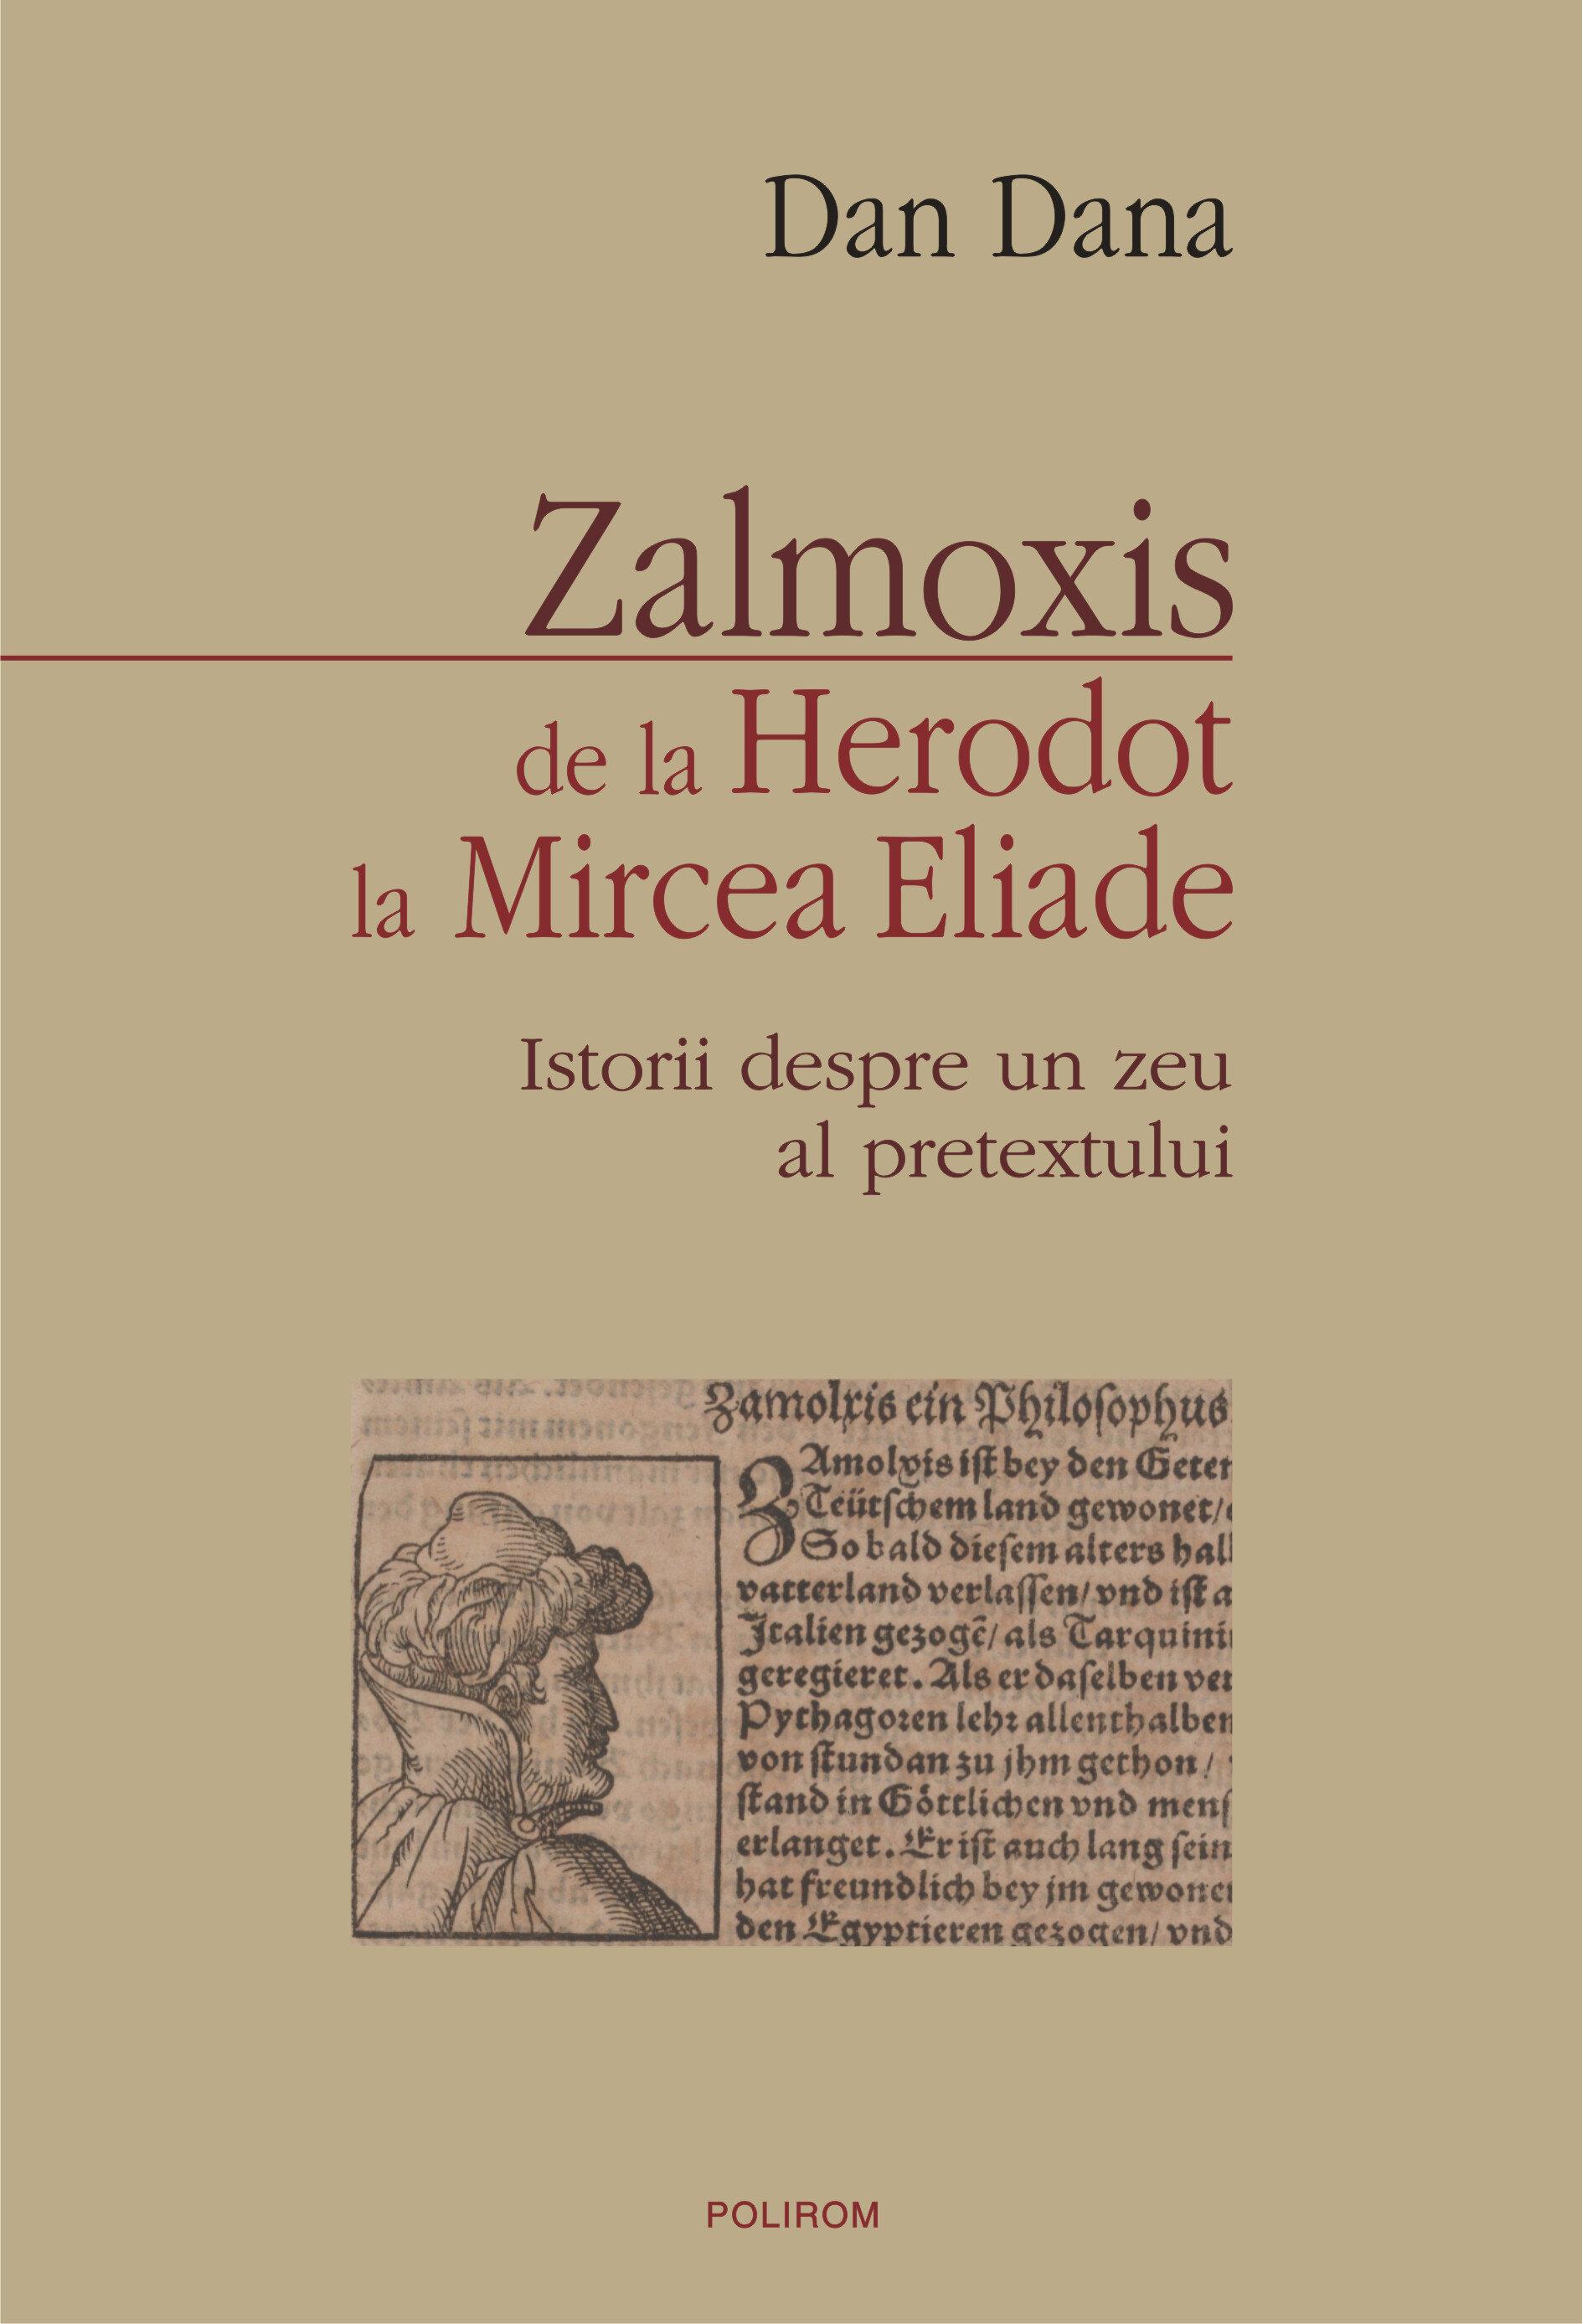 Coperta Carte Zalmoxis de la Herodot la Mircea Eliade. Istorii despre un zeu al pretextului